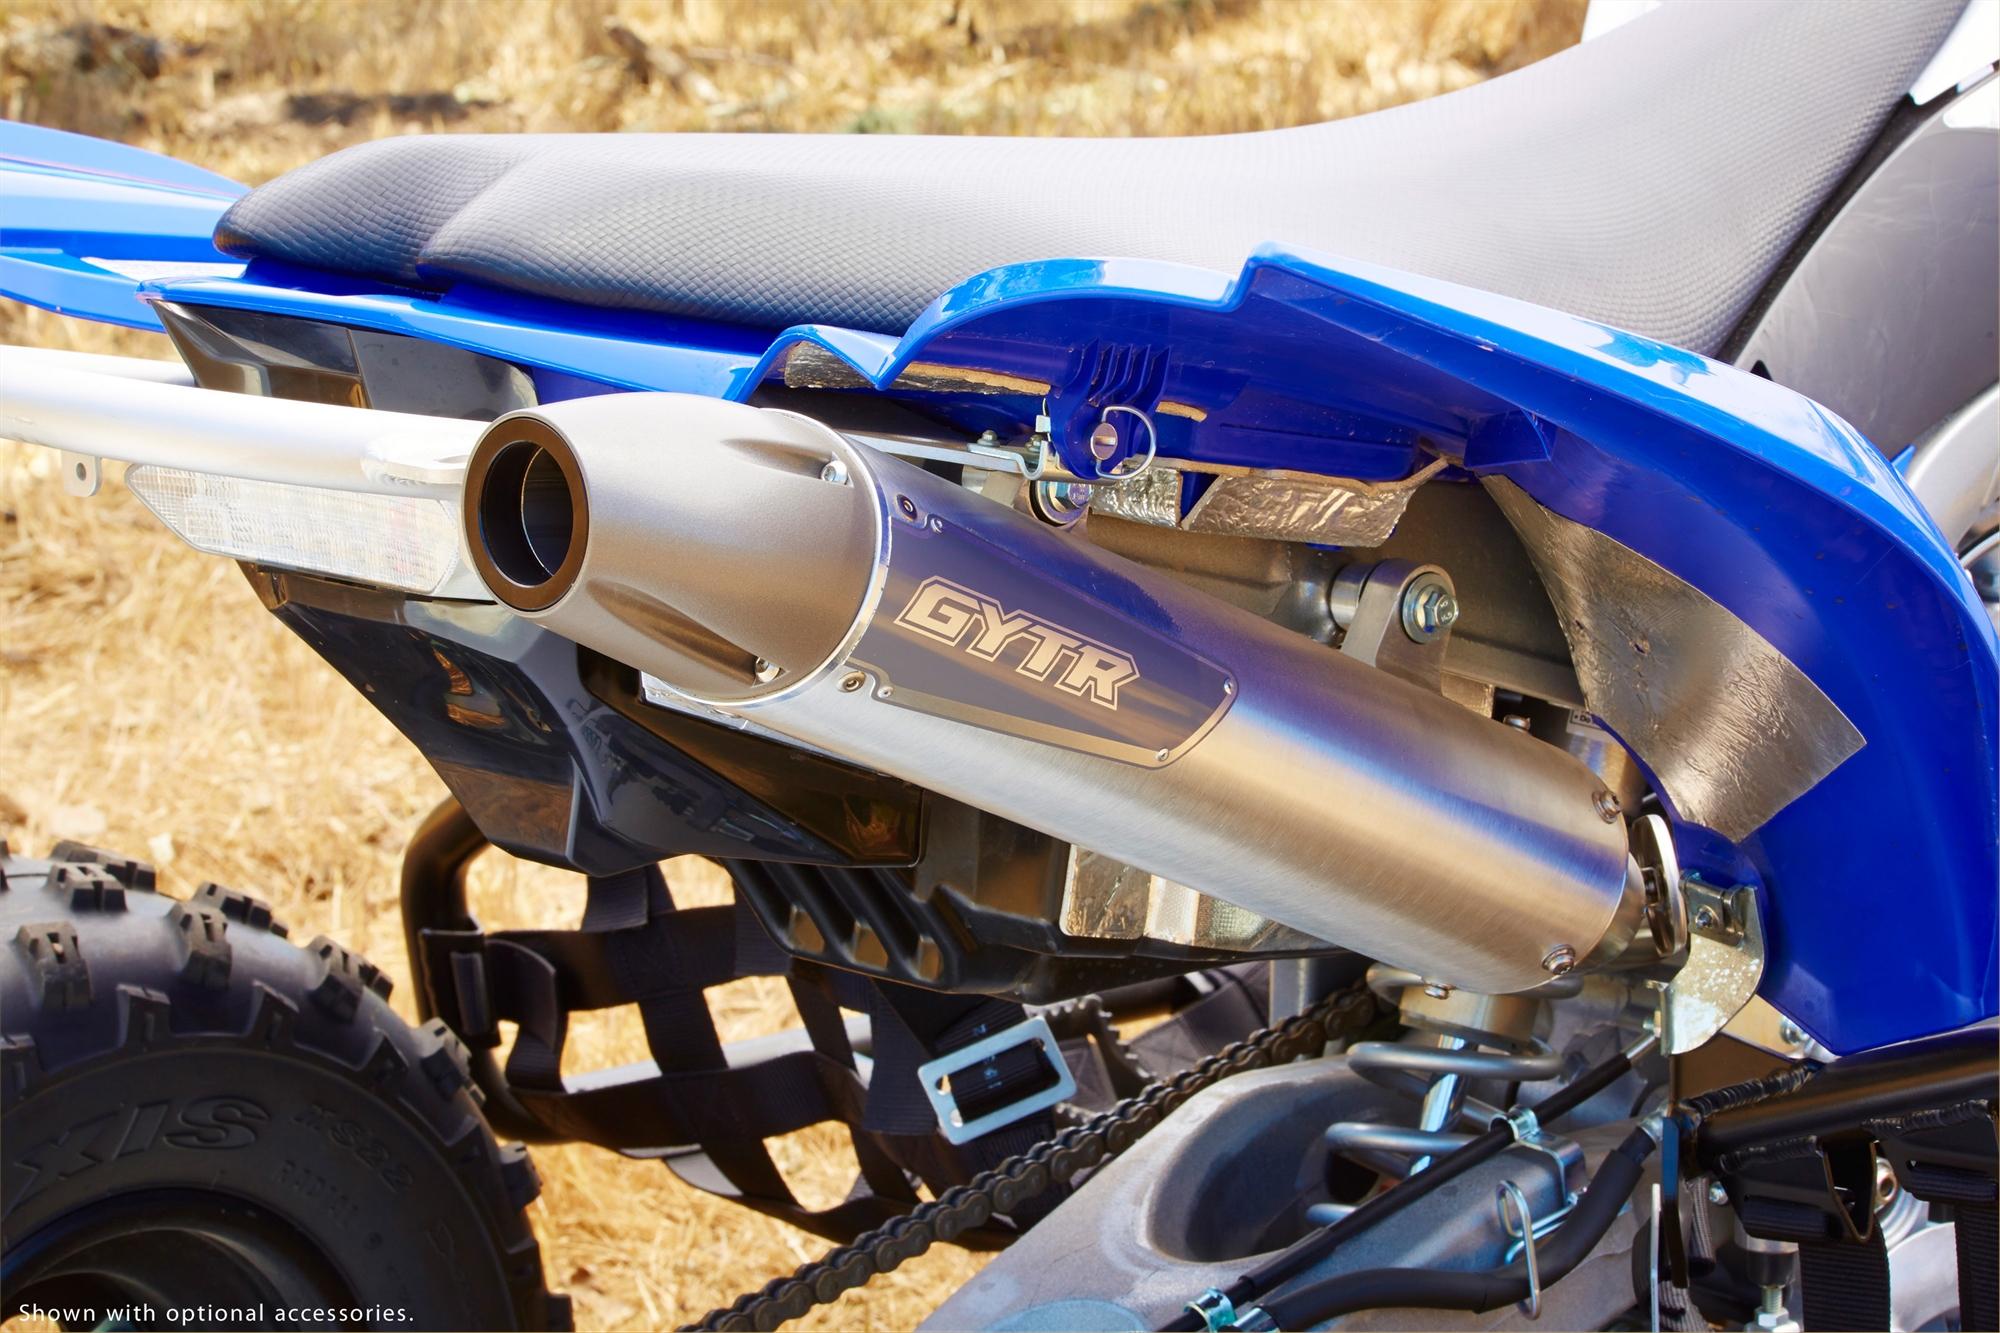 Yamaha Yfz450r Specs 2013 2014 Autoevolution Pin Moto 4 Wiring Diagram On Pinterest